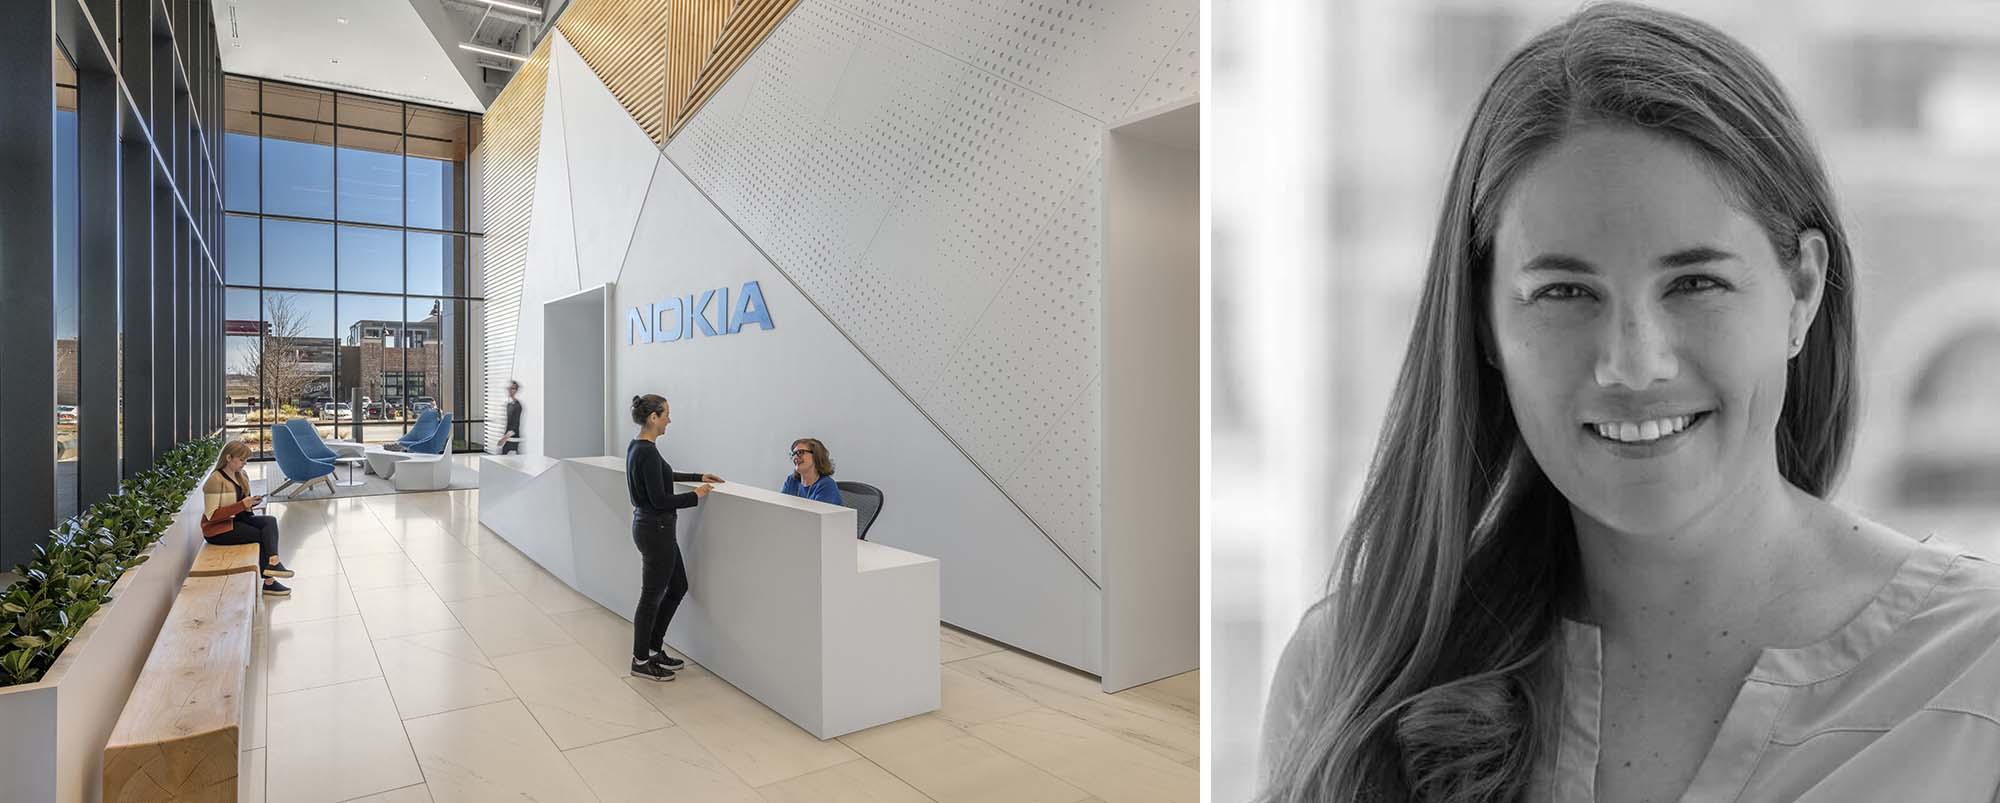 Trái: Văn phòng Nokia tại Dallas, Texas, của CallisonRTKL; Phải: Jodi Williams